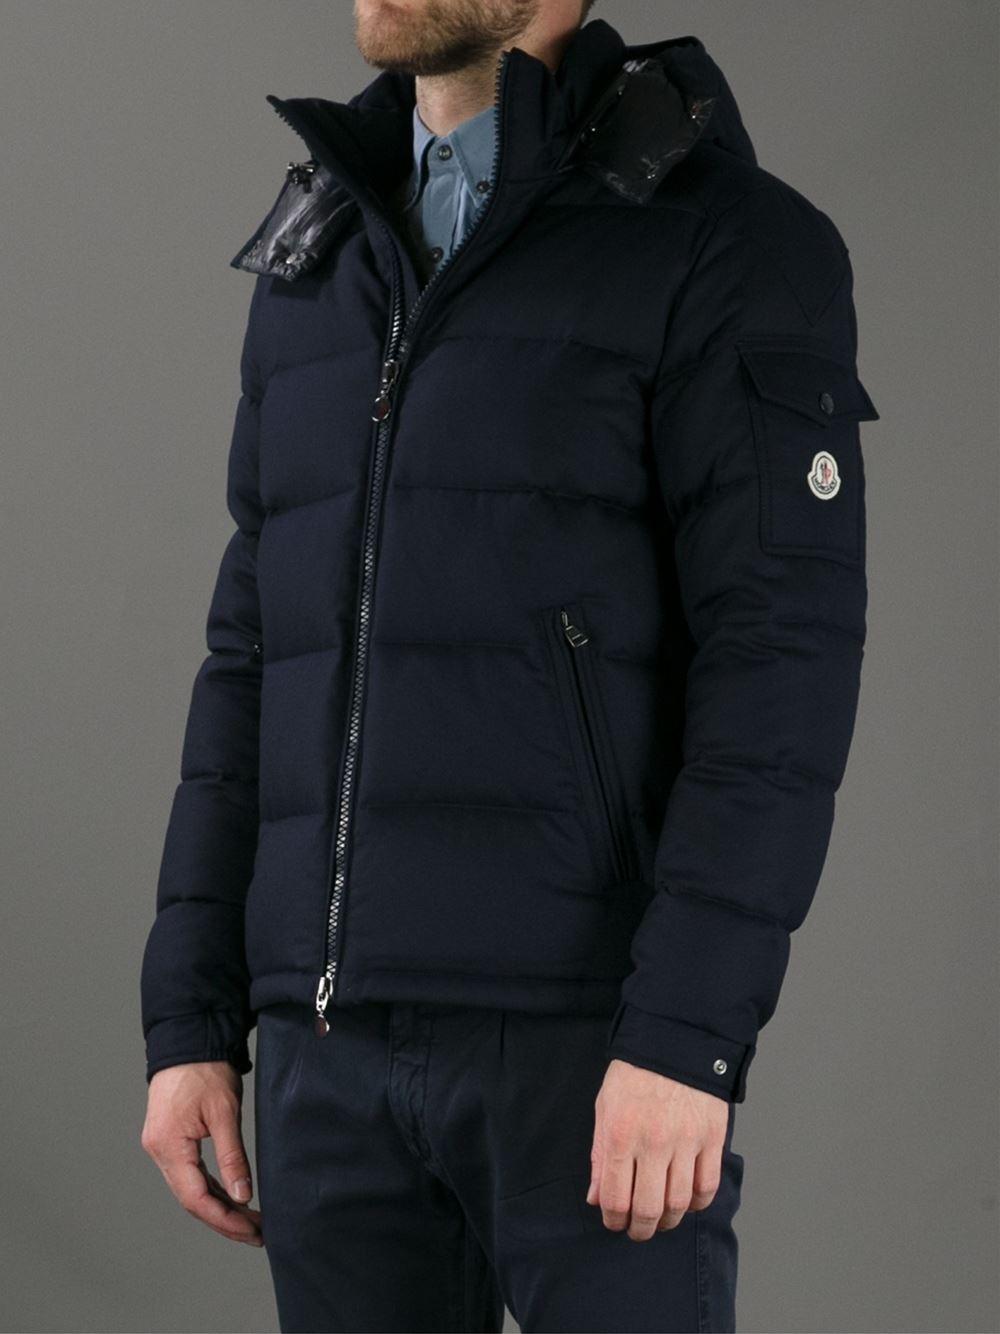 Moncler Montgenevre Padded Jacket In Black For Men Lyst